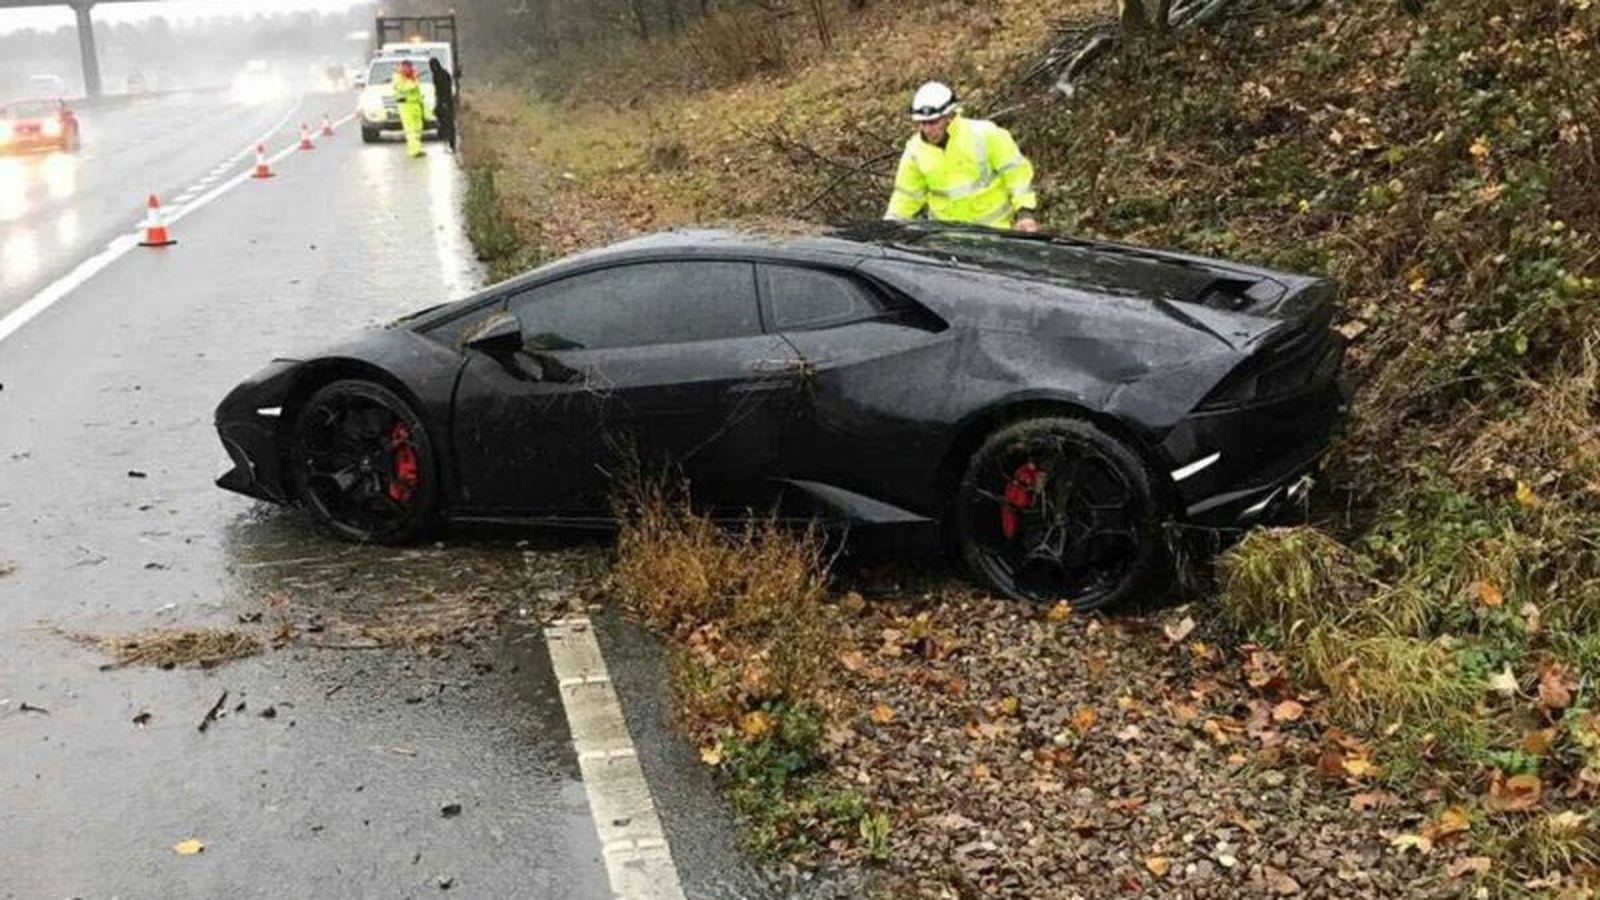 Premier League Star Wrecks Lamborghini And Everyone Loses Their Mind Lamborghini Star Wreck Premier League